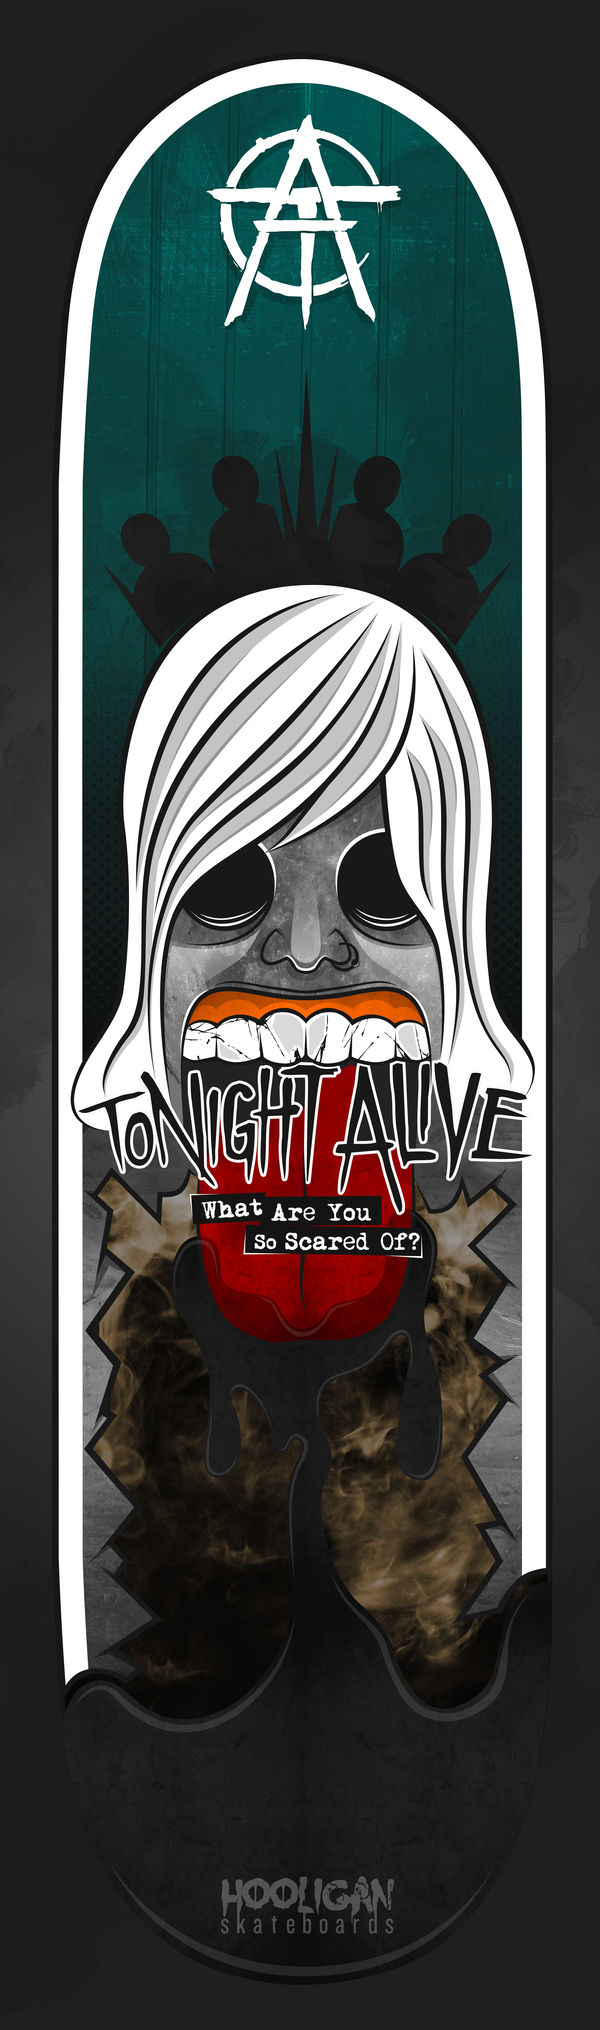 Tonight Alive Sk8Board by B-boyAlfelor